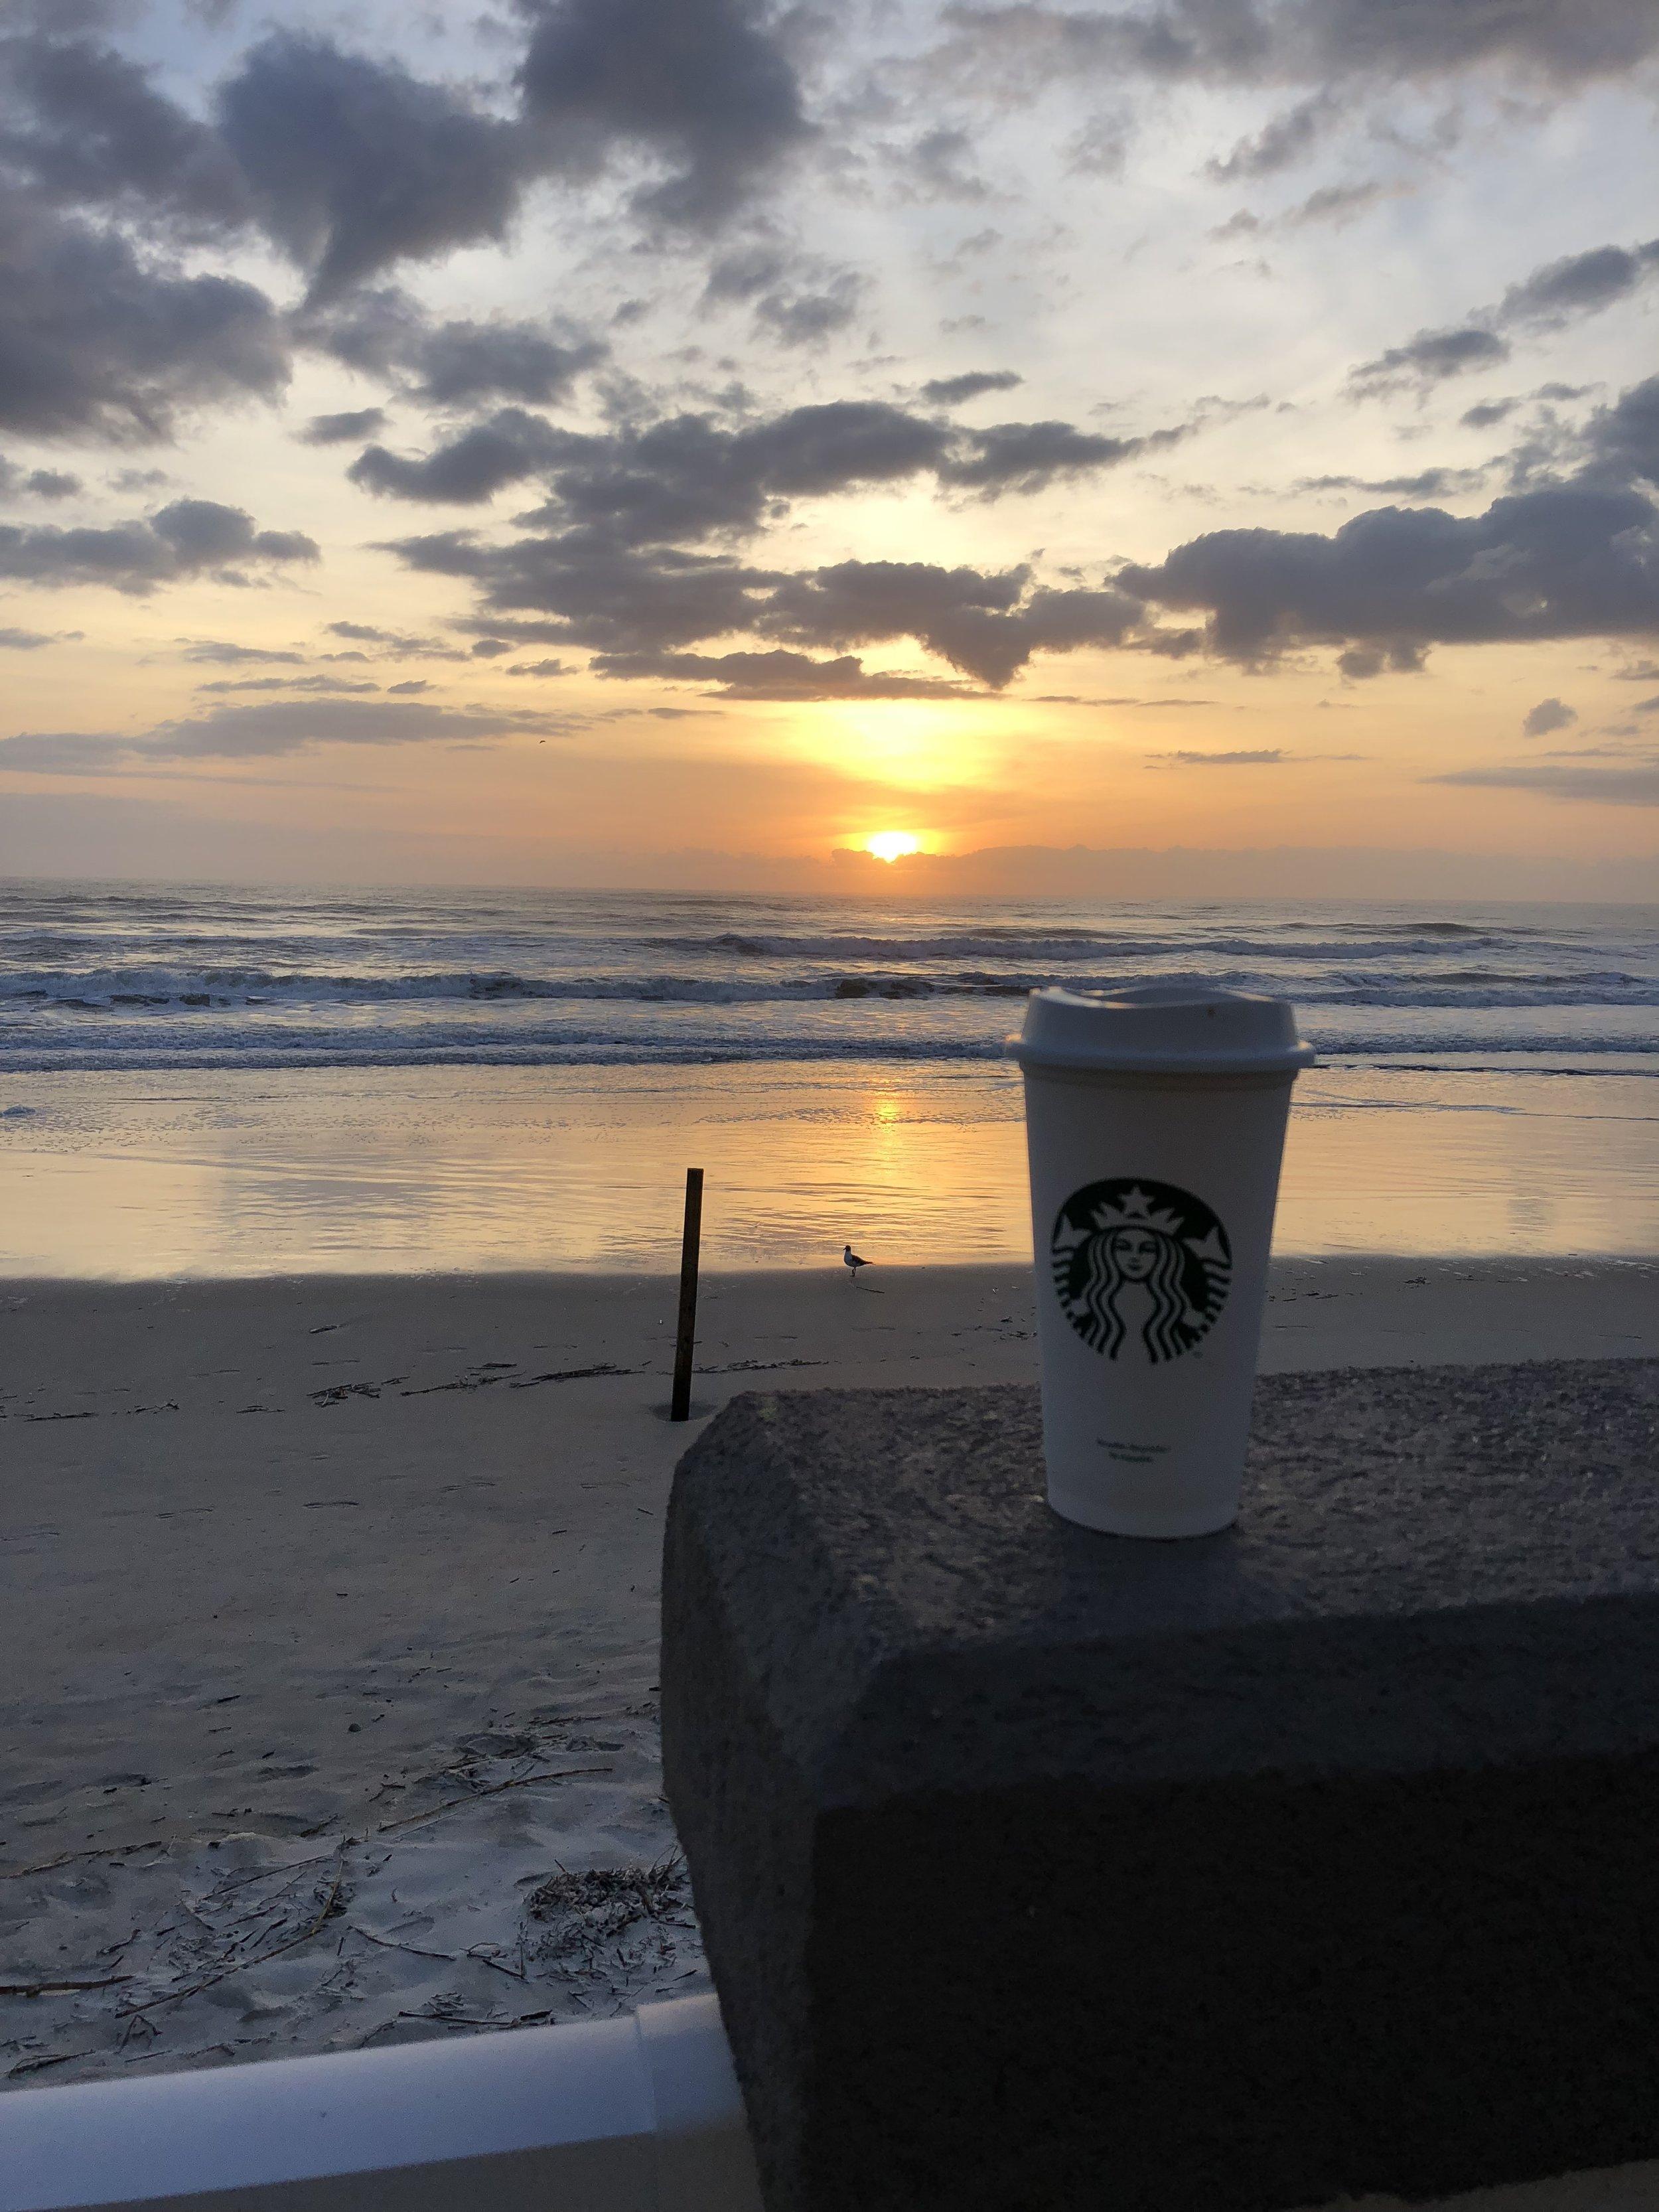 04.13.18 Daytona Beach Starbucks.jpeg